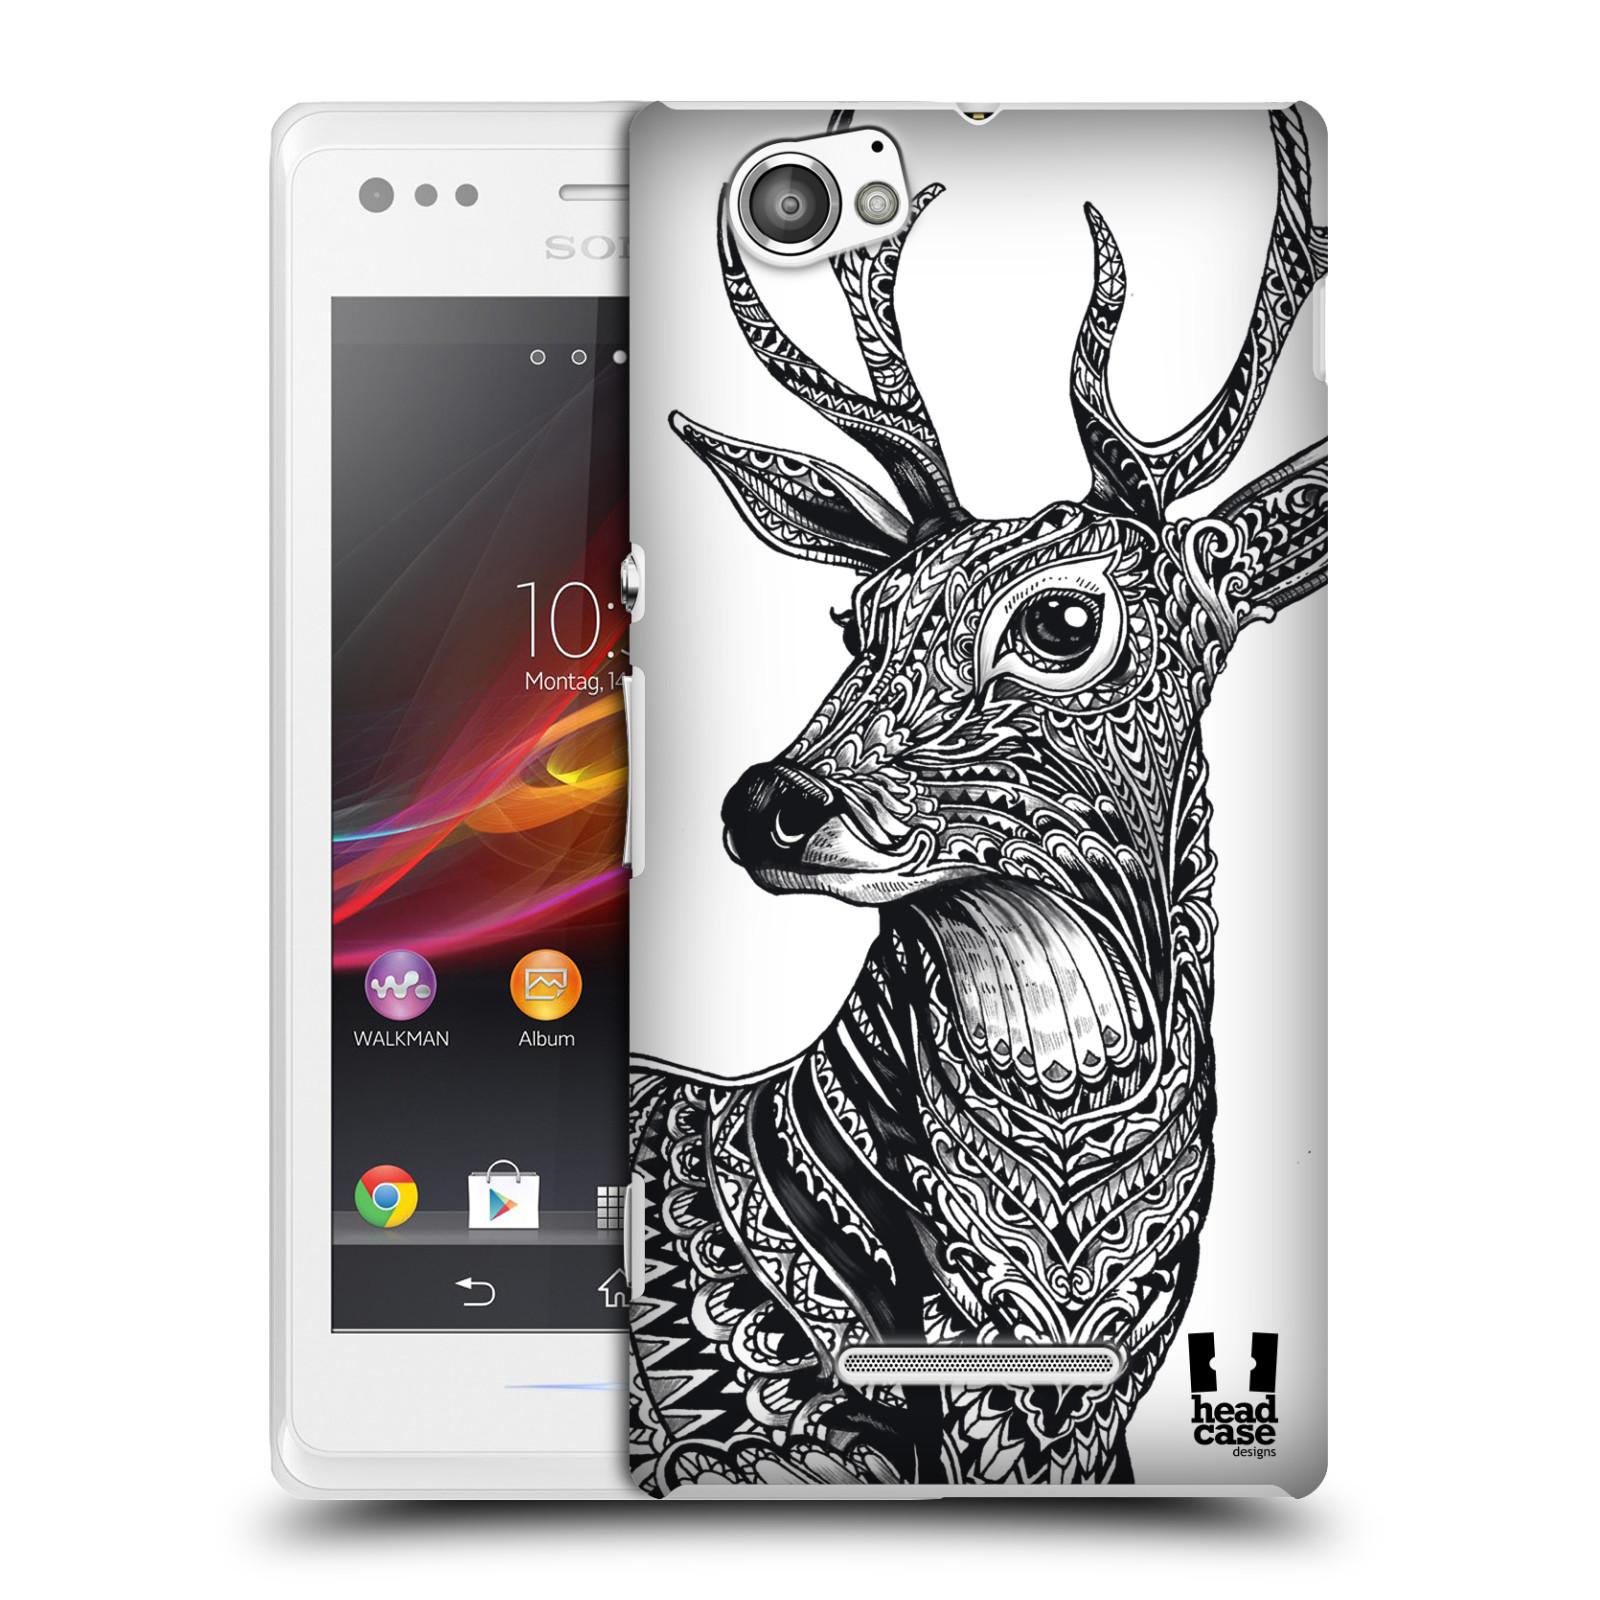 Plastové pouzdro na mobil Sony Xperia M C1905 HEAD CASE Zdobený Jelínek (Plastový kryt či obal na mobilní telefon Sony Xperia M )